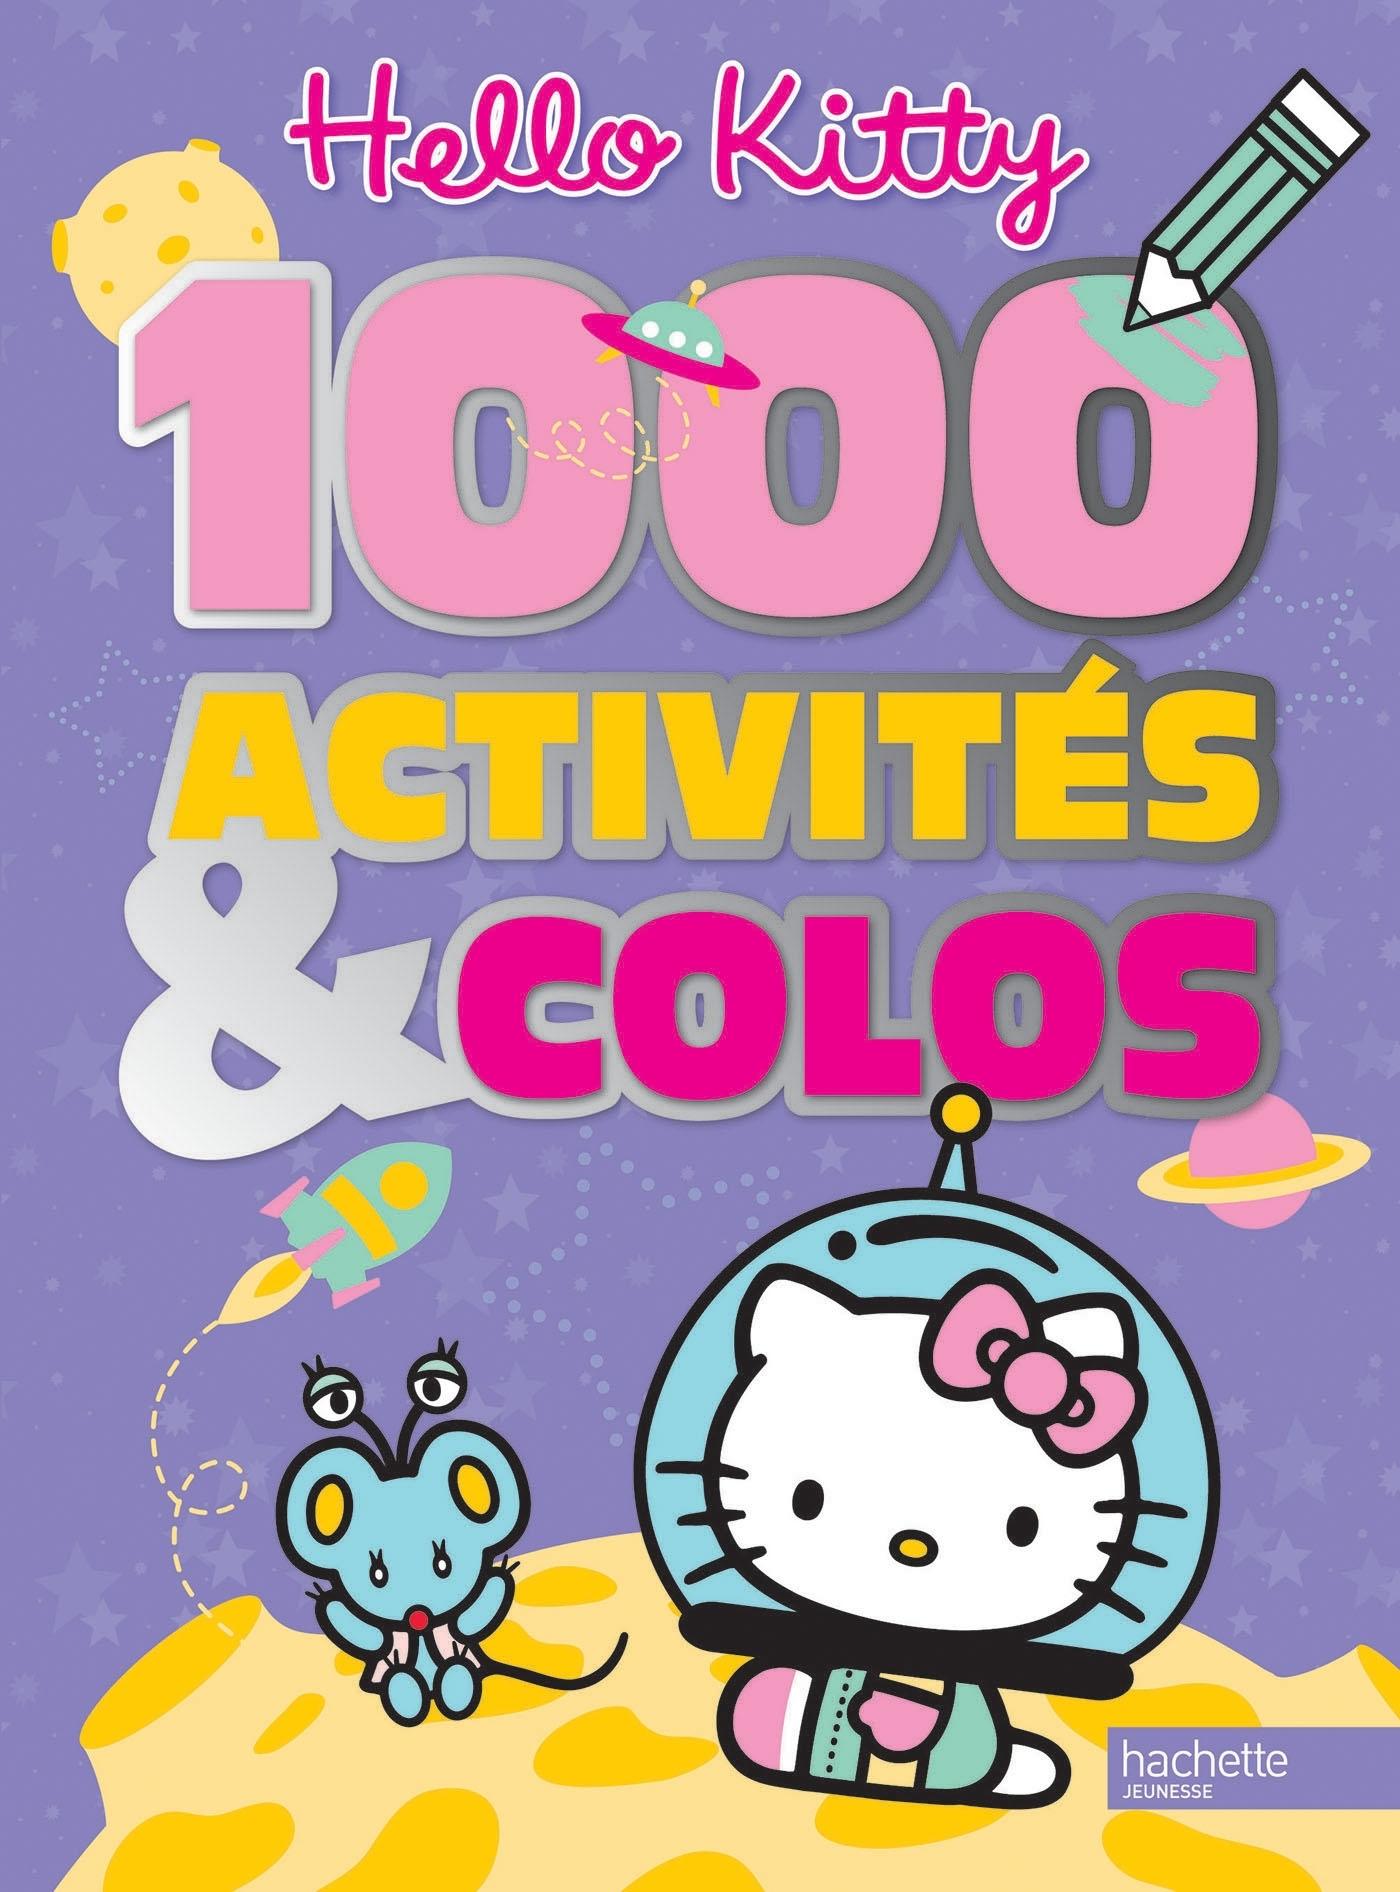 HELLO KITTY / 1 000 ACTIVITES ET COLOS